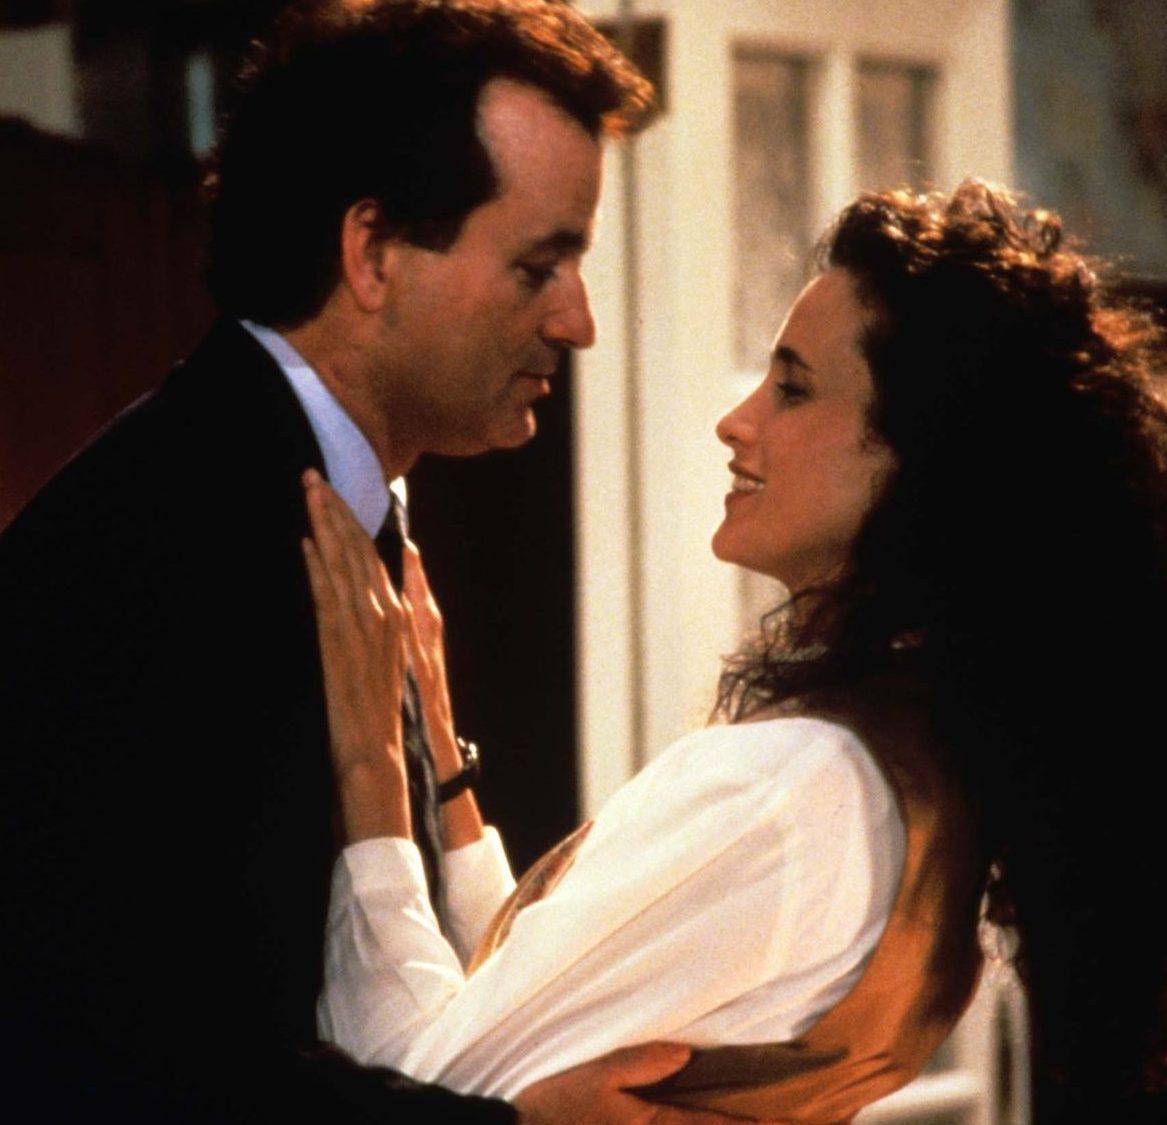 MV5BMTU1MjE5MDA4MV5BMl5BanBnXkFtZTcwMDAxMTkxNA@@. V1 e1597744760825 20 Great Movie Romances That Are Actually Deeply Problematic